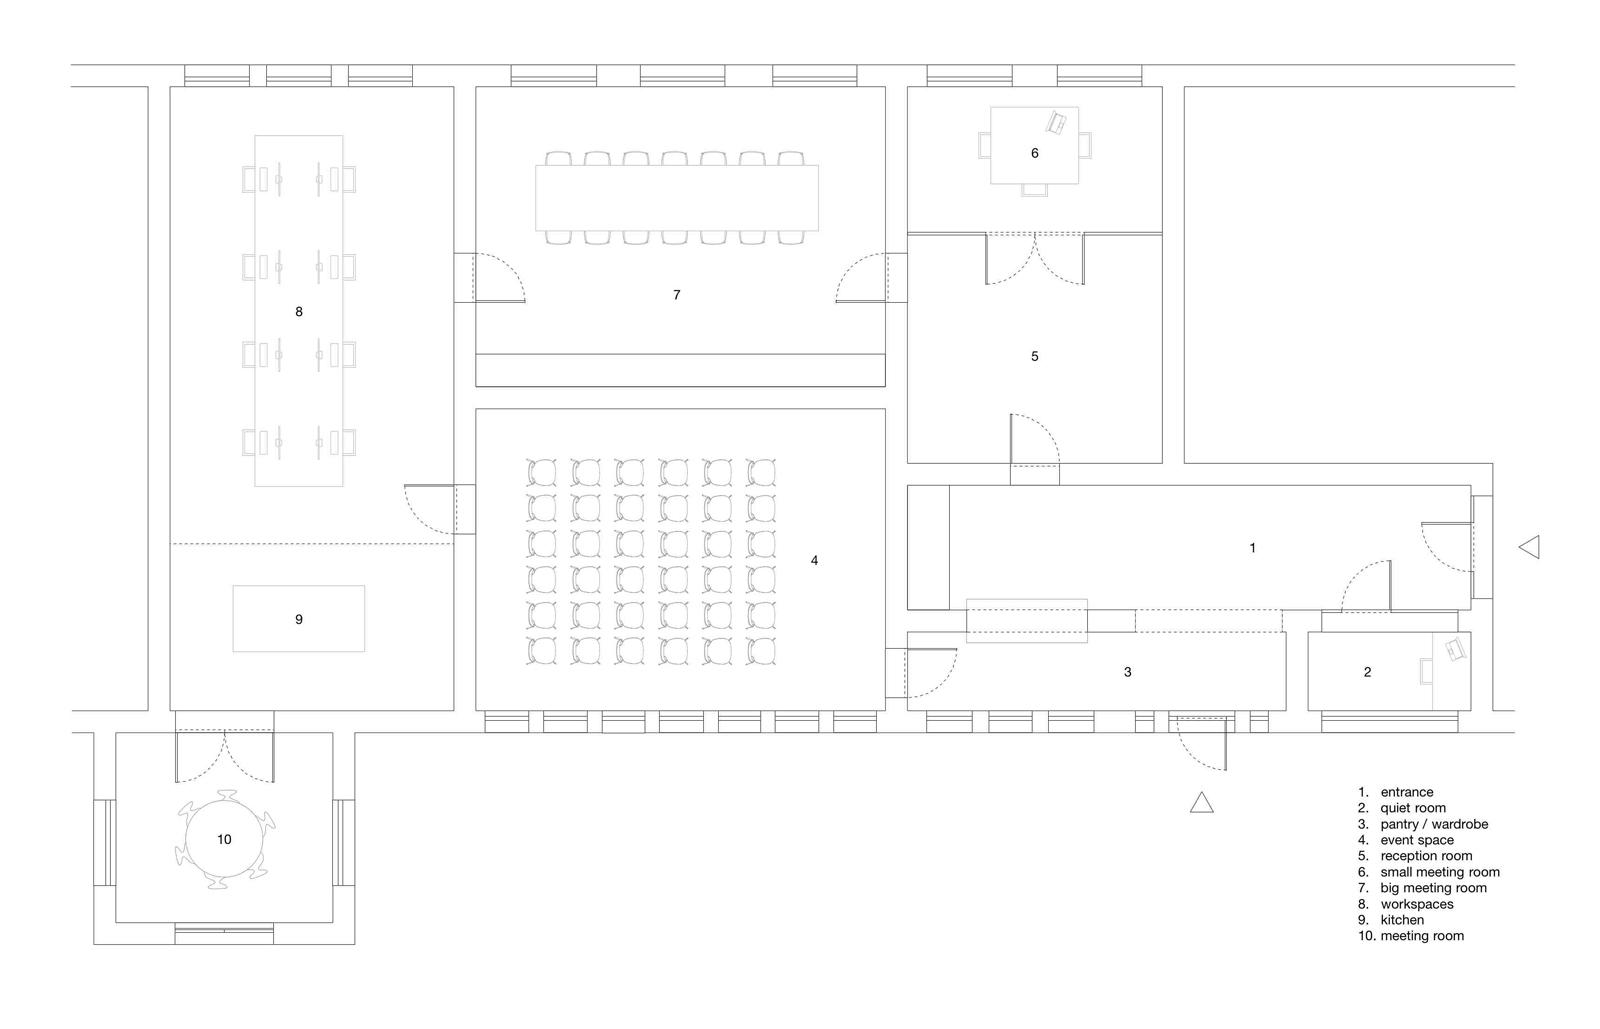 TWWB architect DDMA office interior floorplan_1600